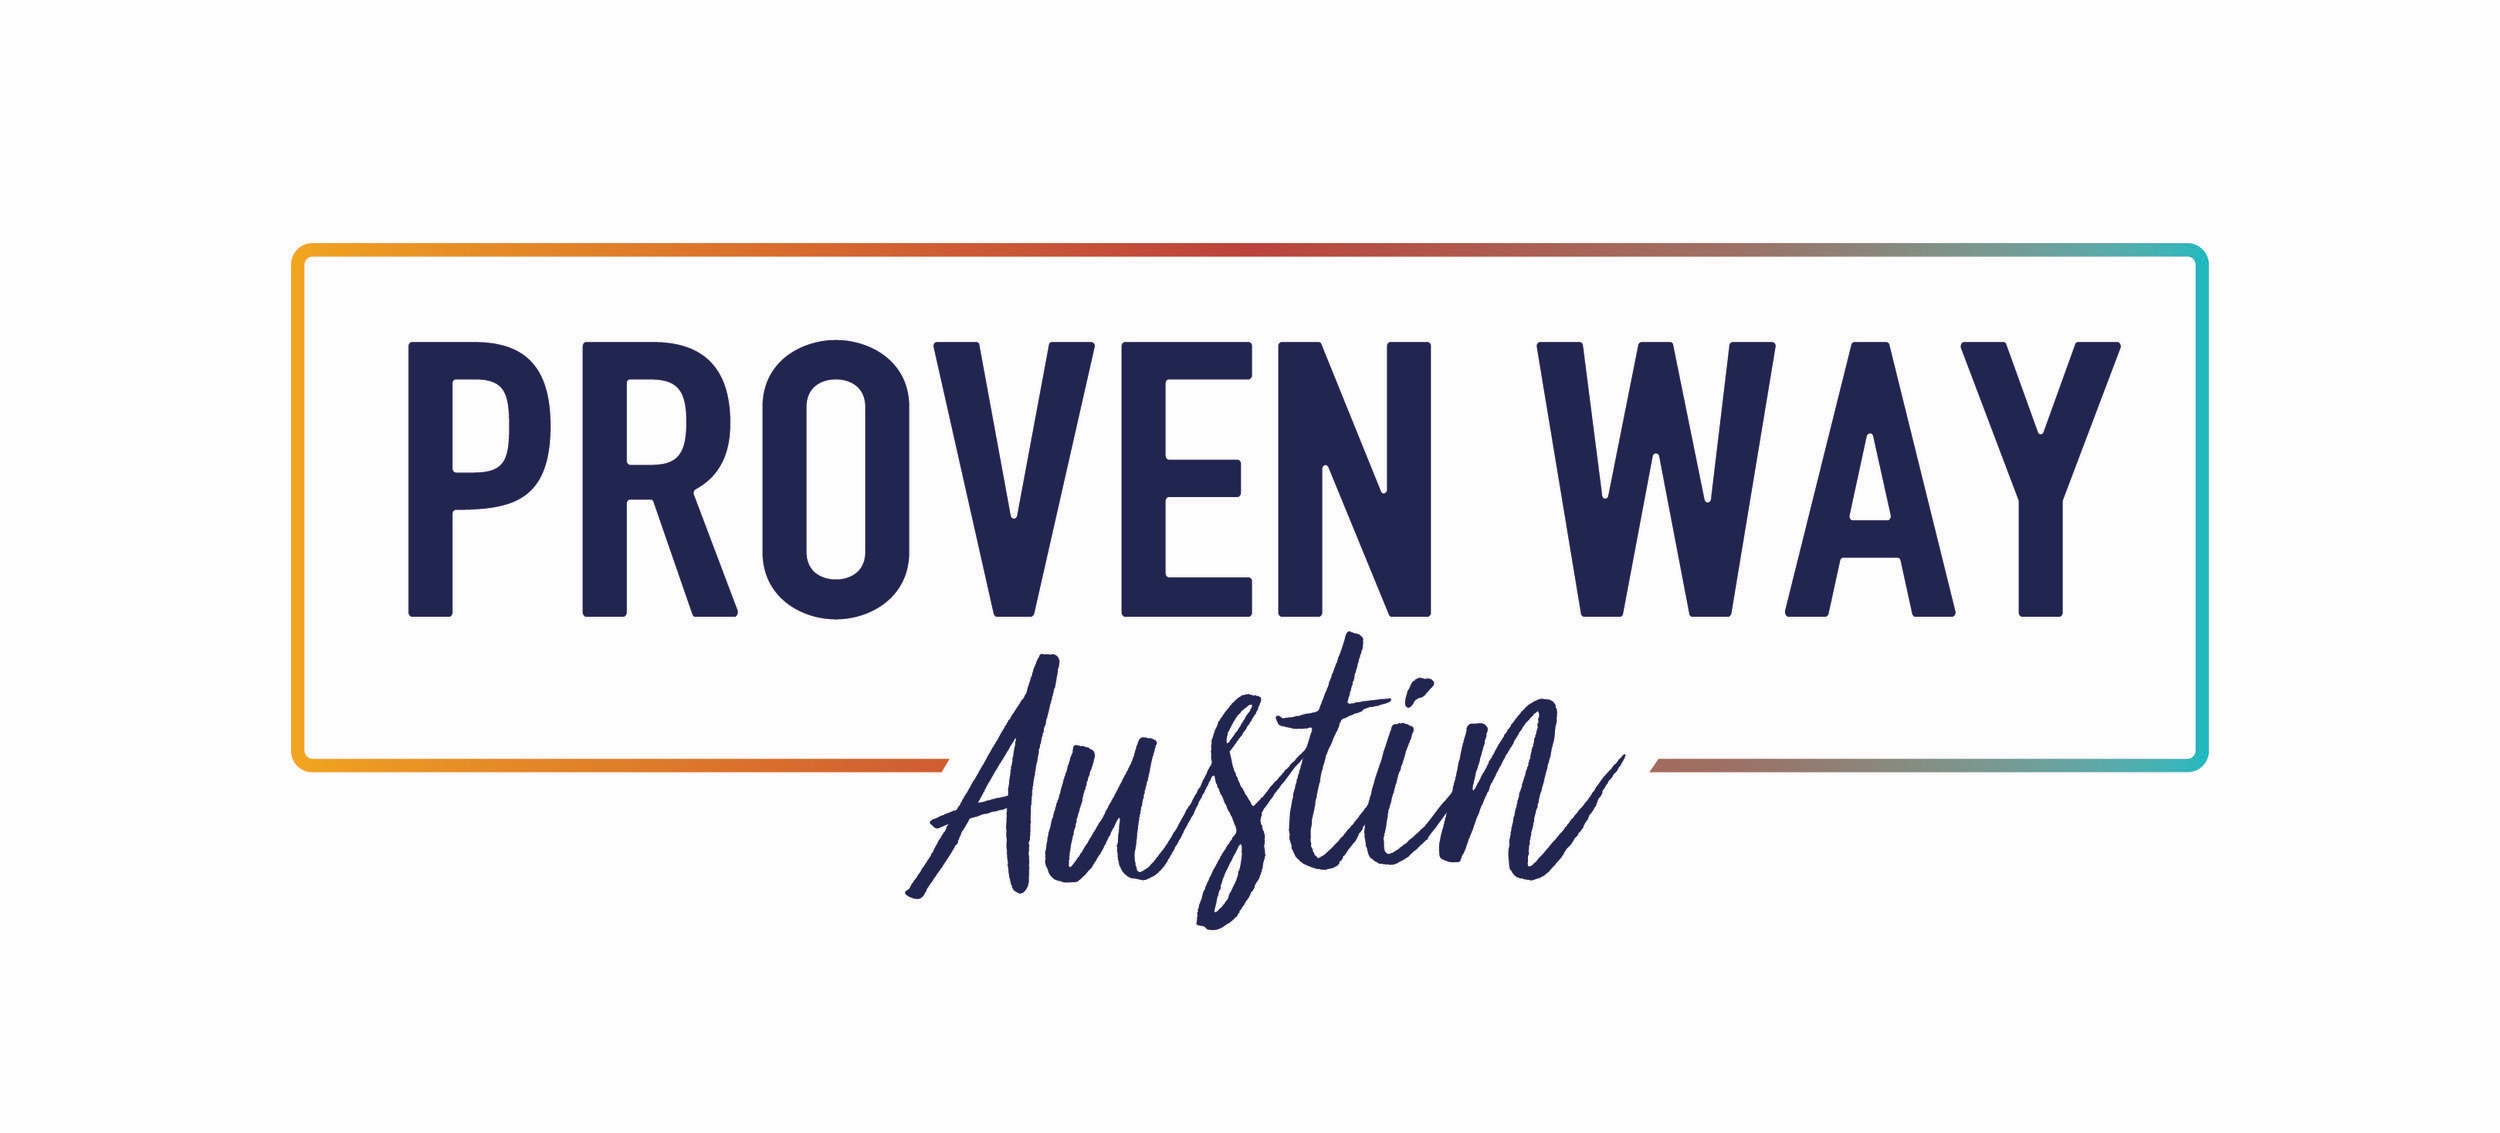 Proven+Way+Austin+Logo.jpg